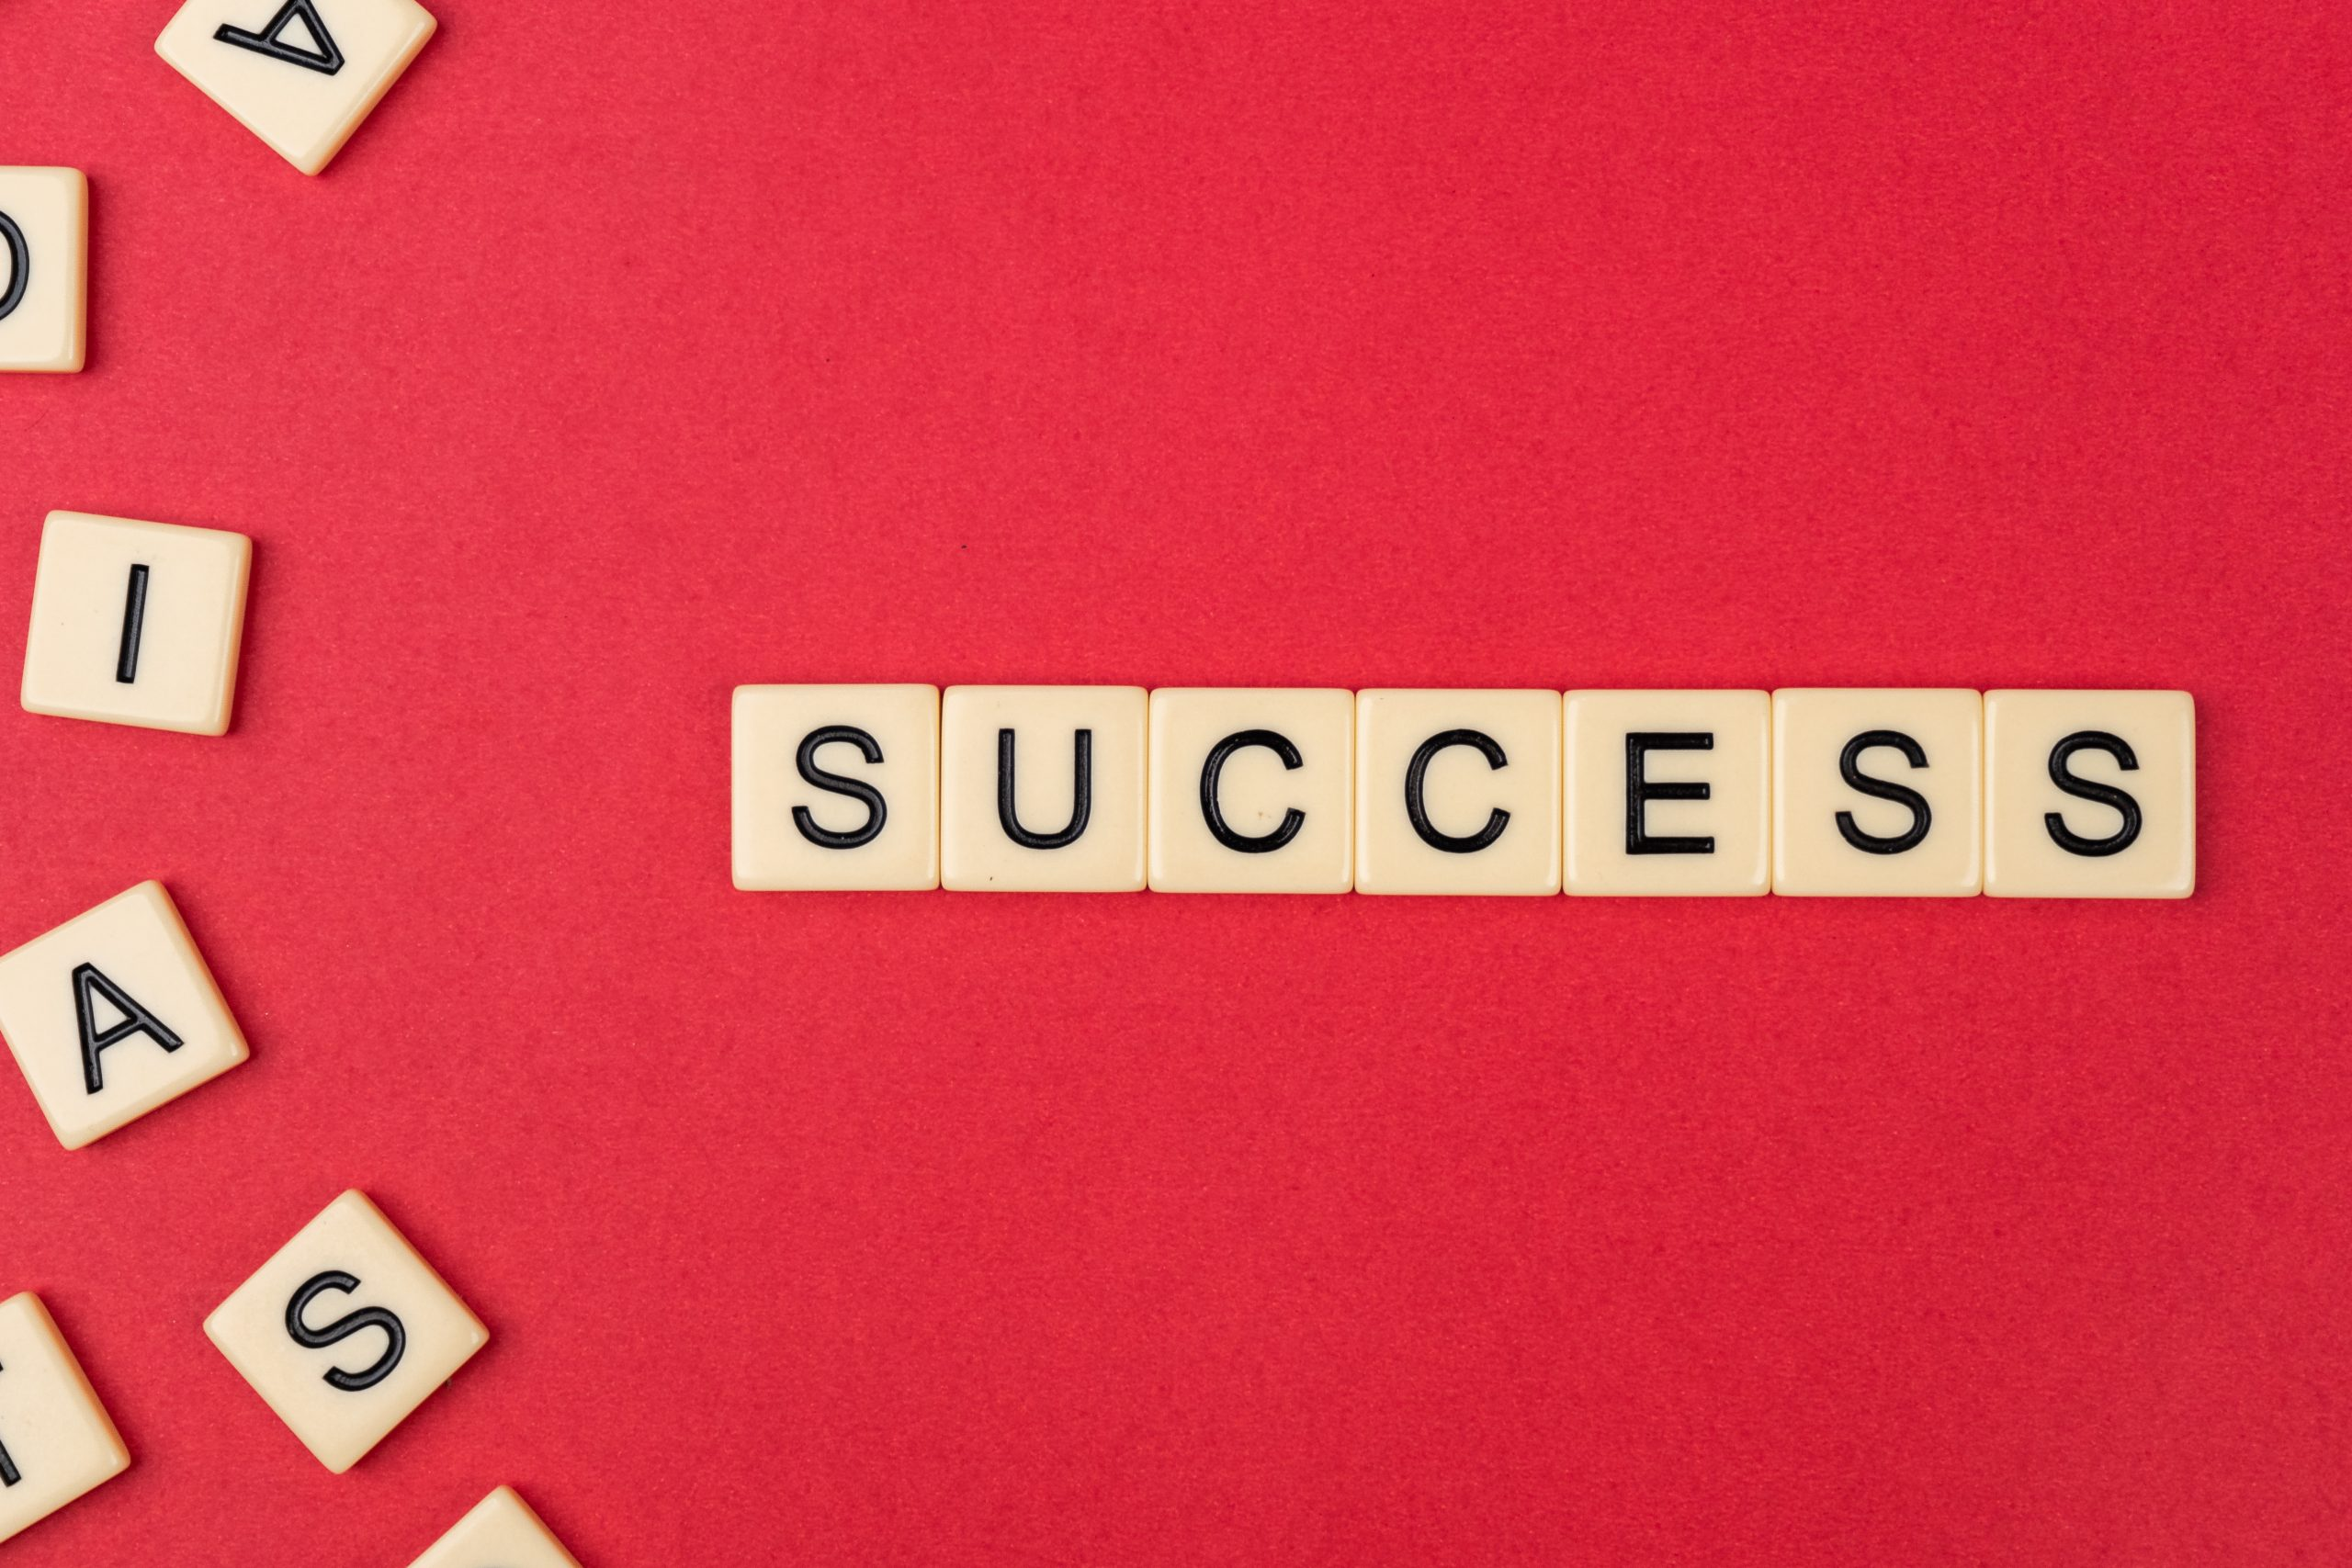 Success written with scrabble